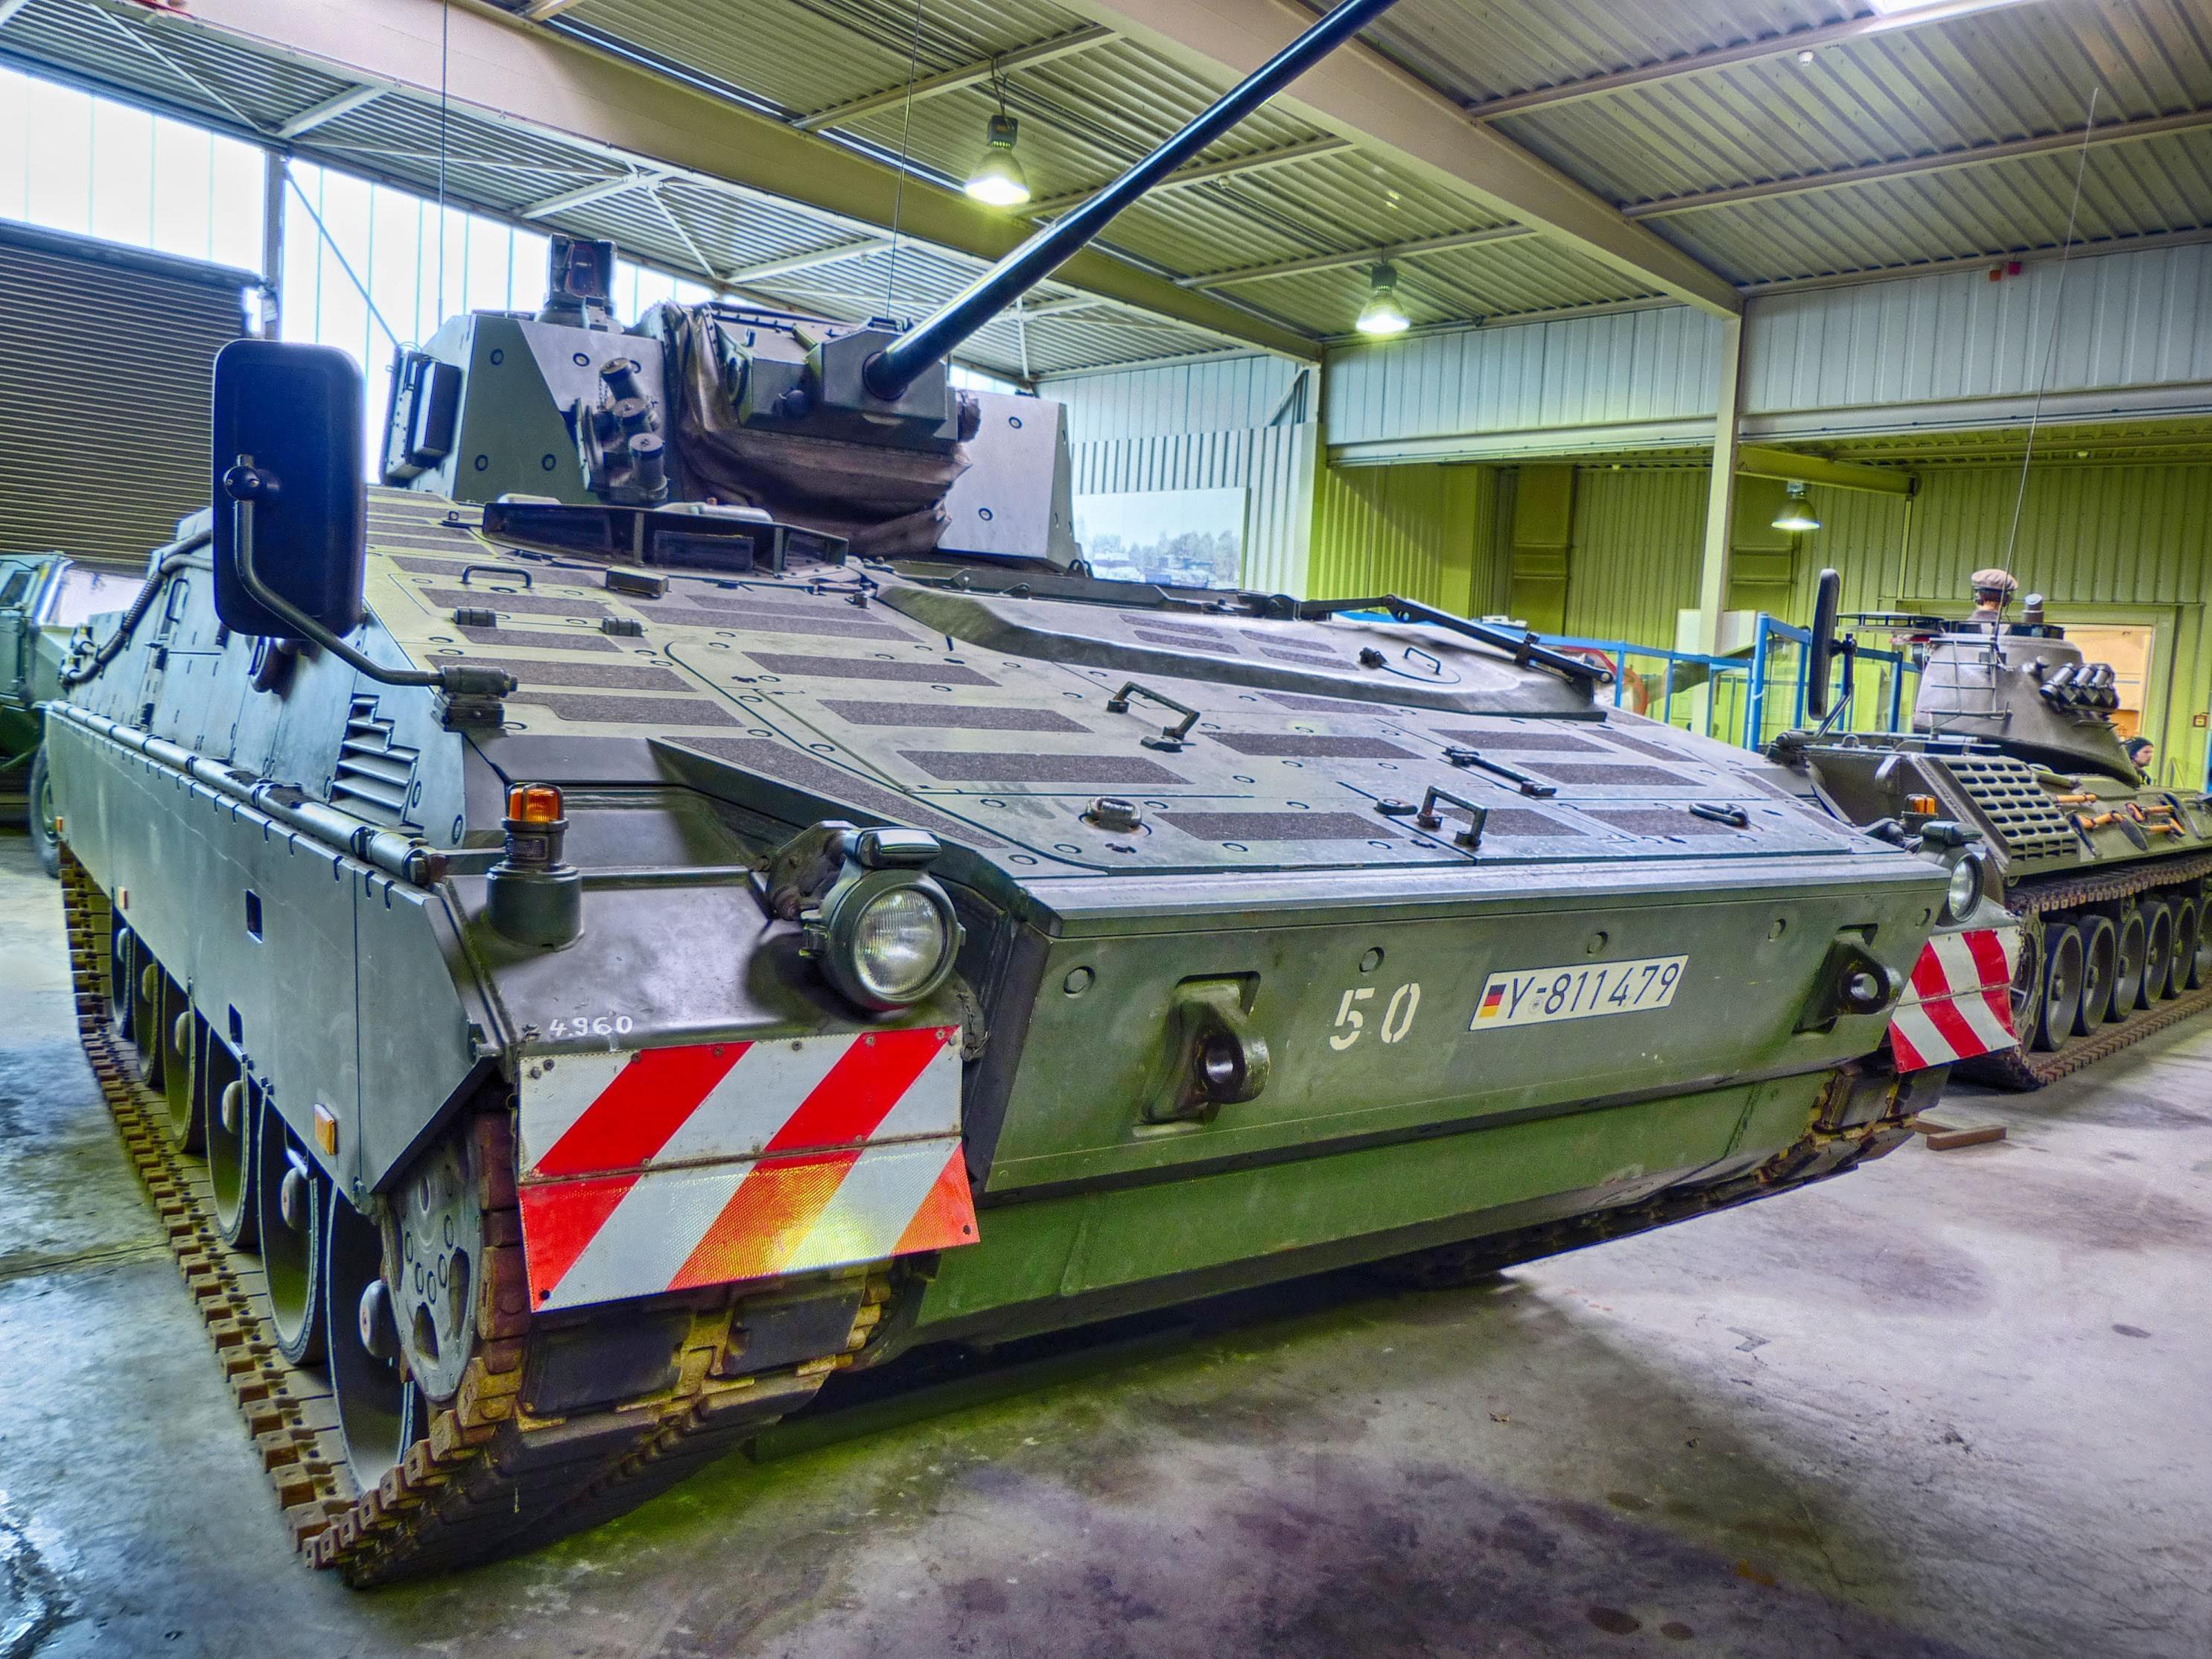 Nov 21, 2017 Drift King Contest Armored Warfare - Silentstalker Winter